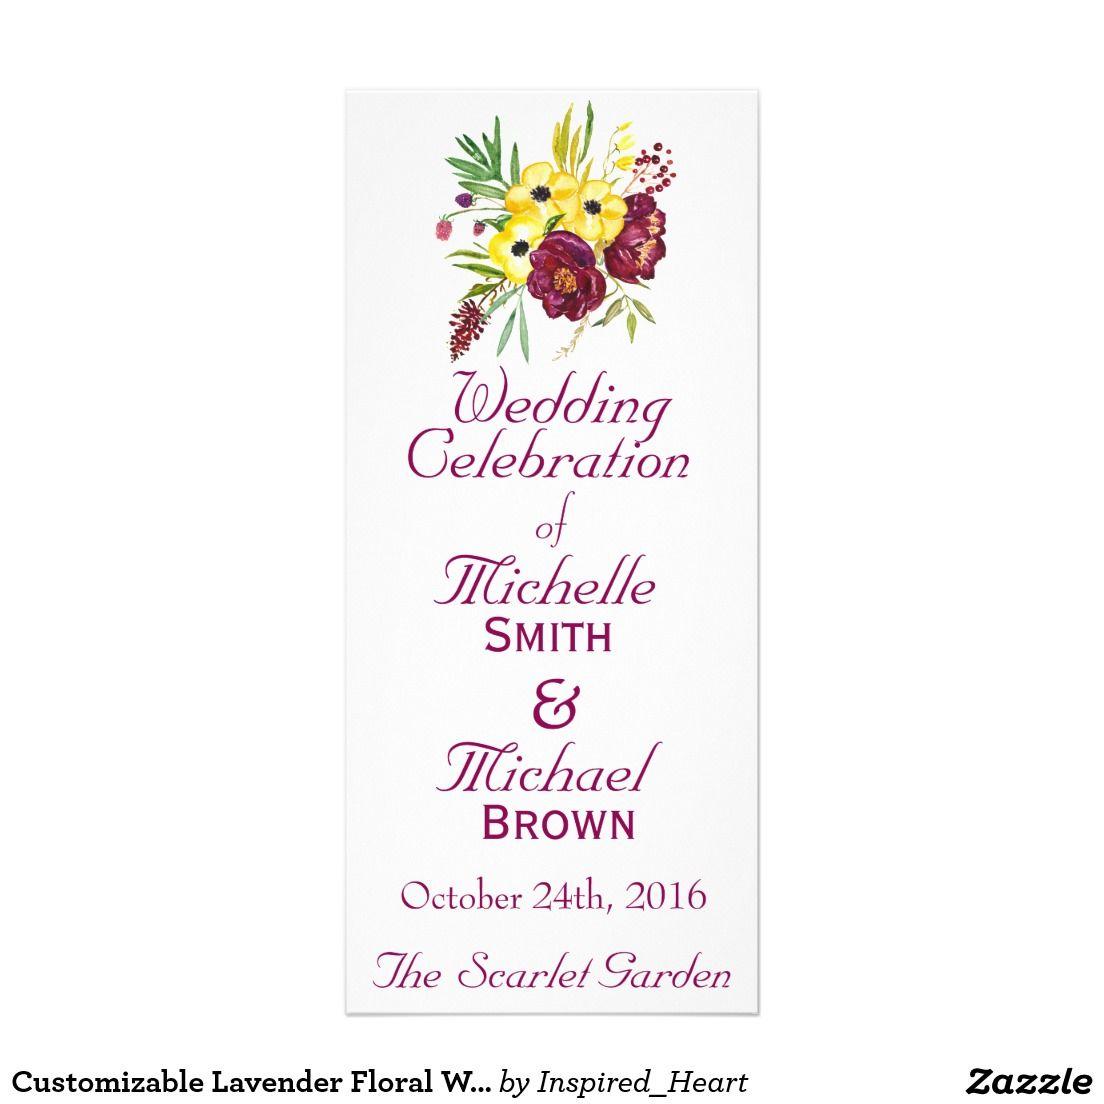 Customizable Lavender Floral WEDDING PROGRAM